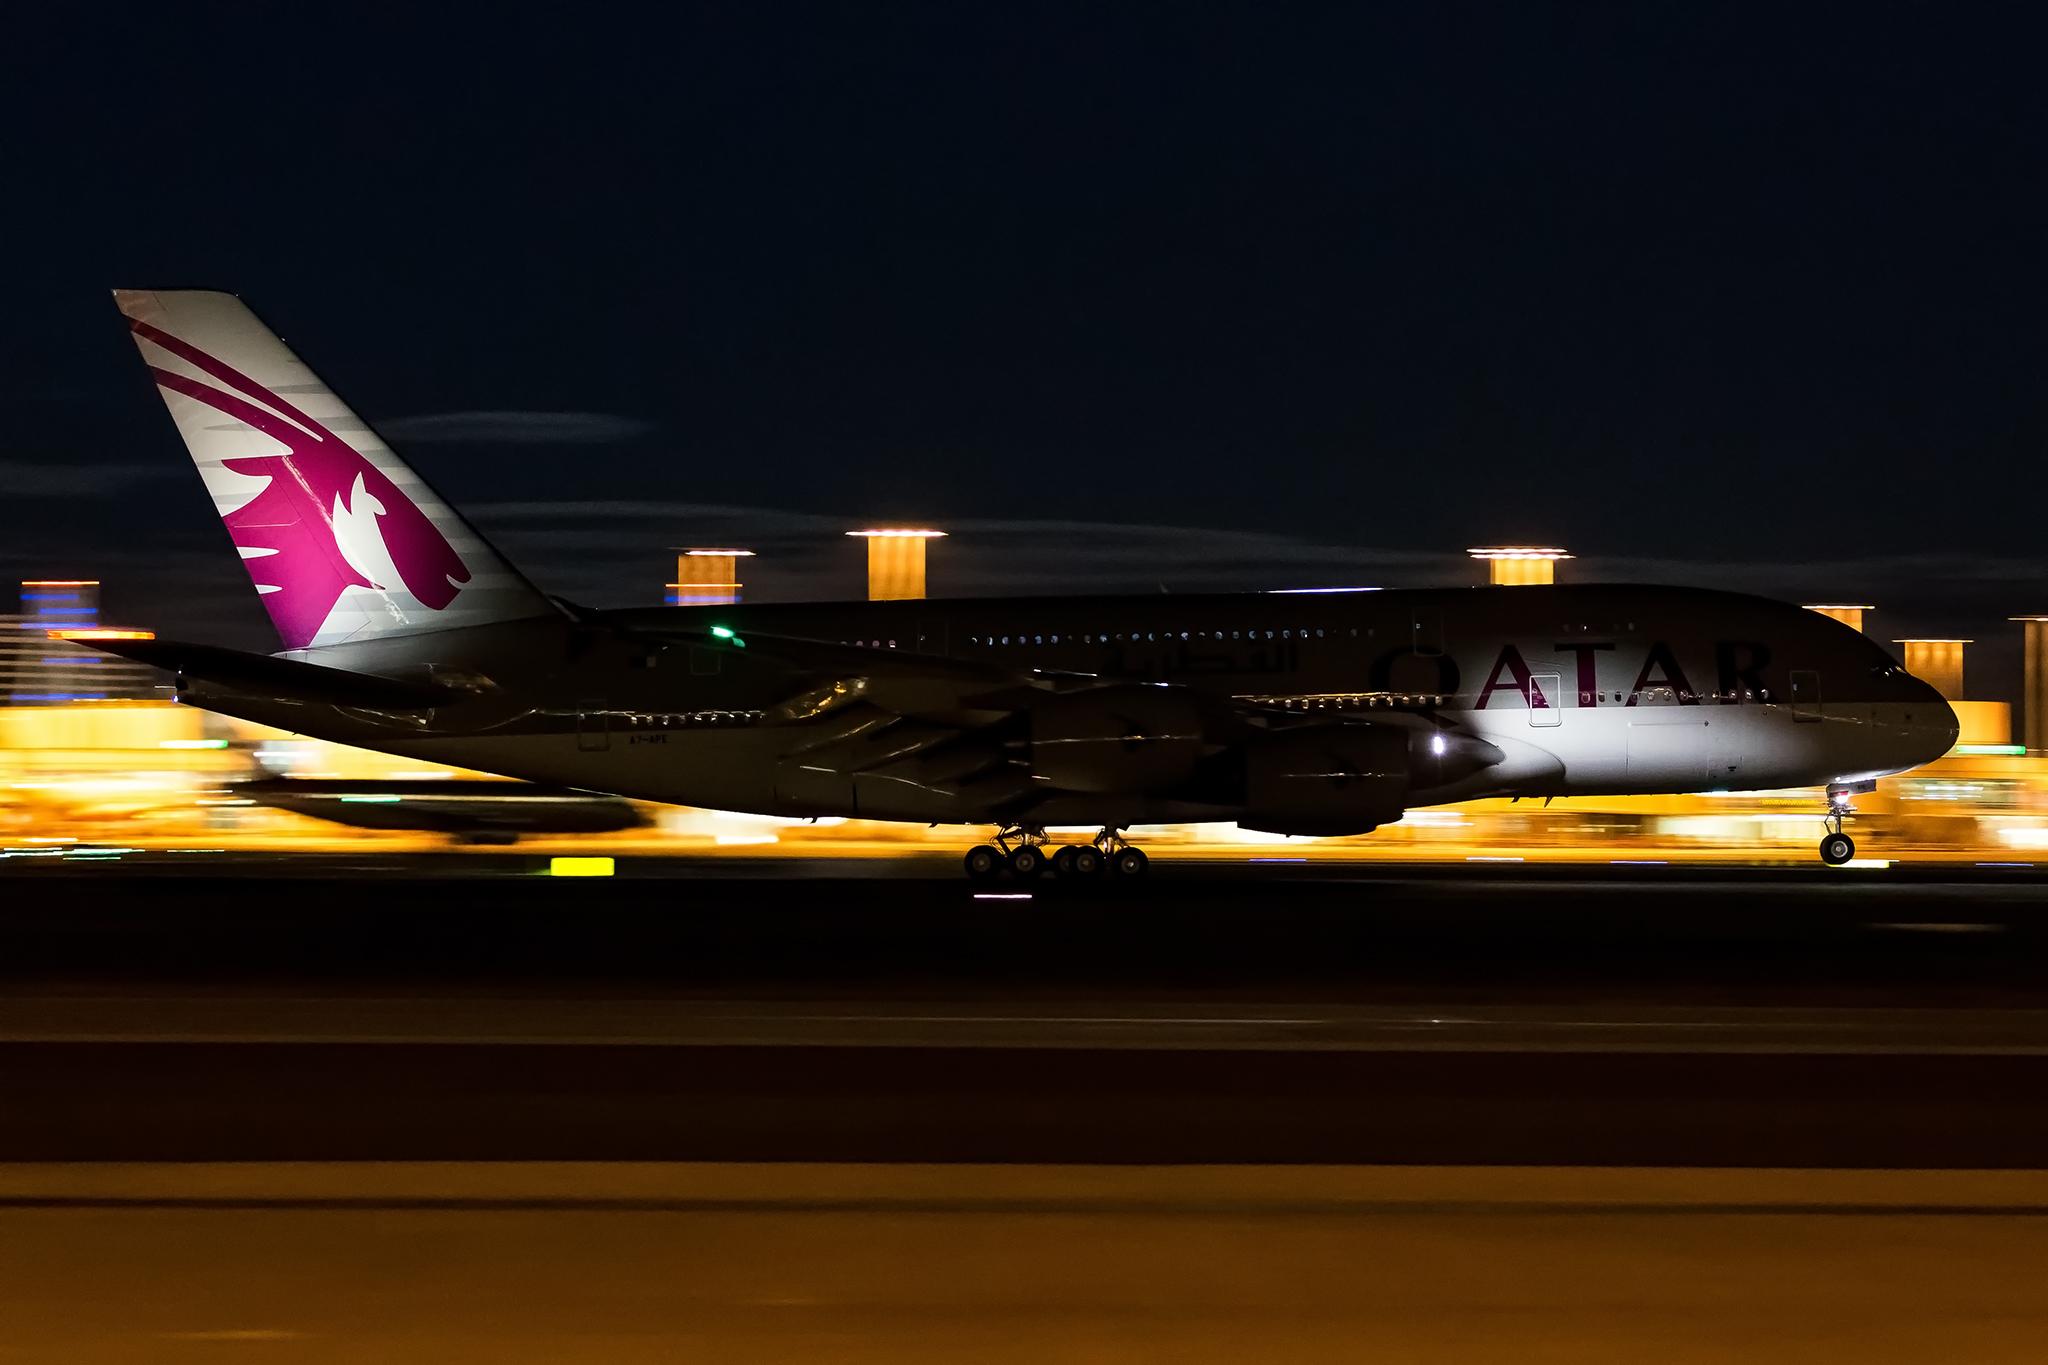 Qatar Airways A380 Arriving Into Sydney Image - Bernard Proctor